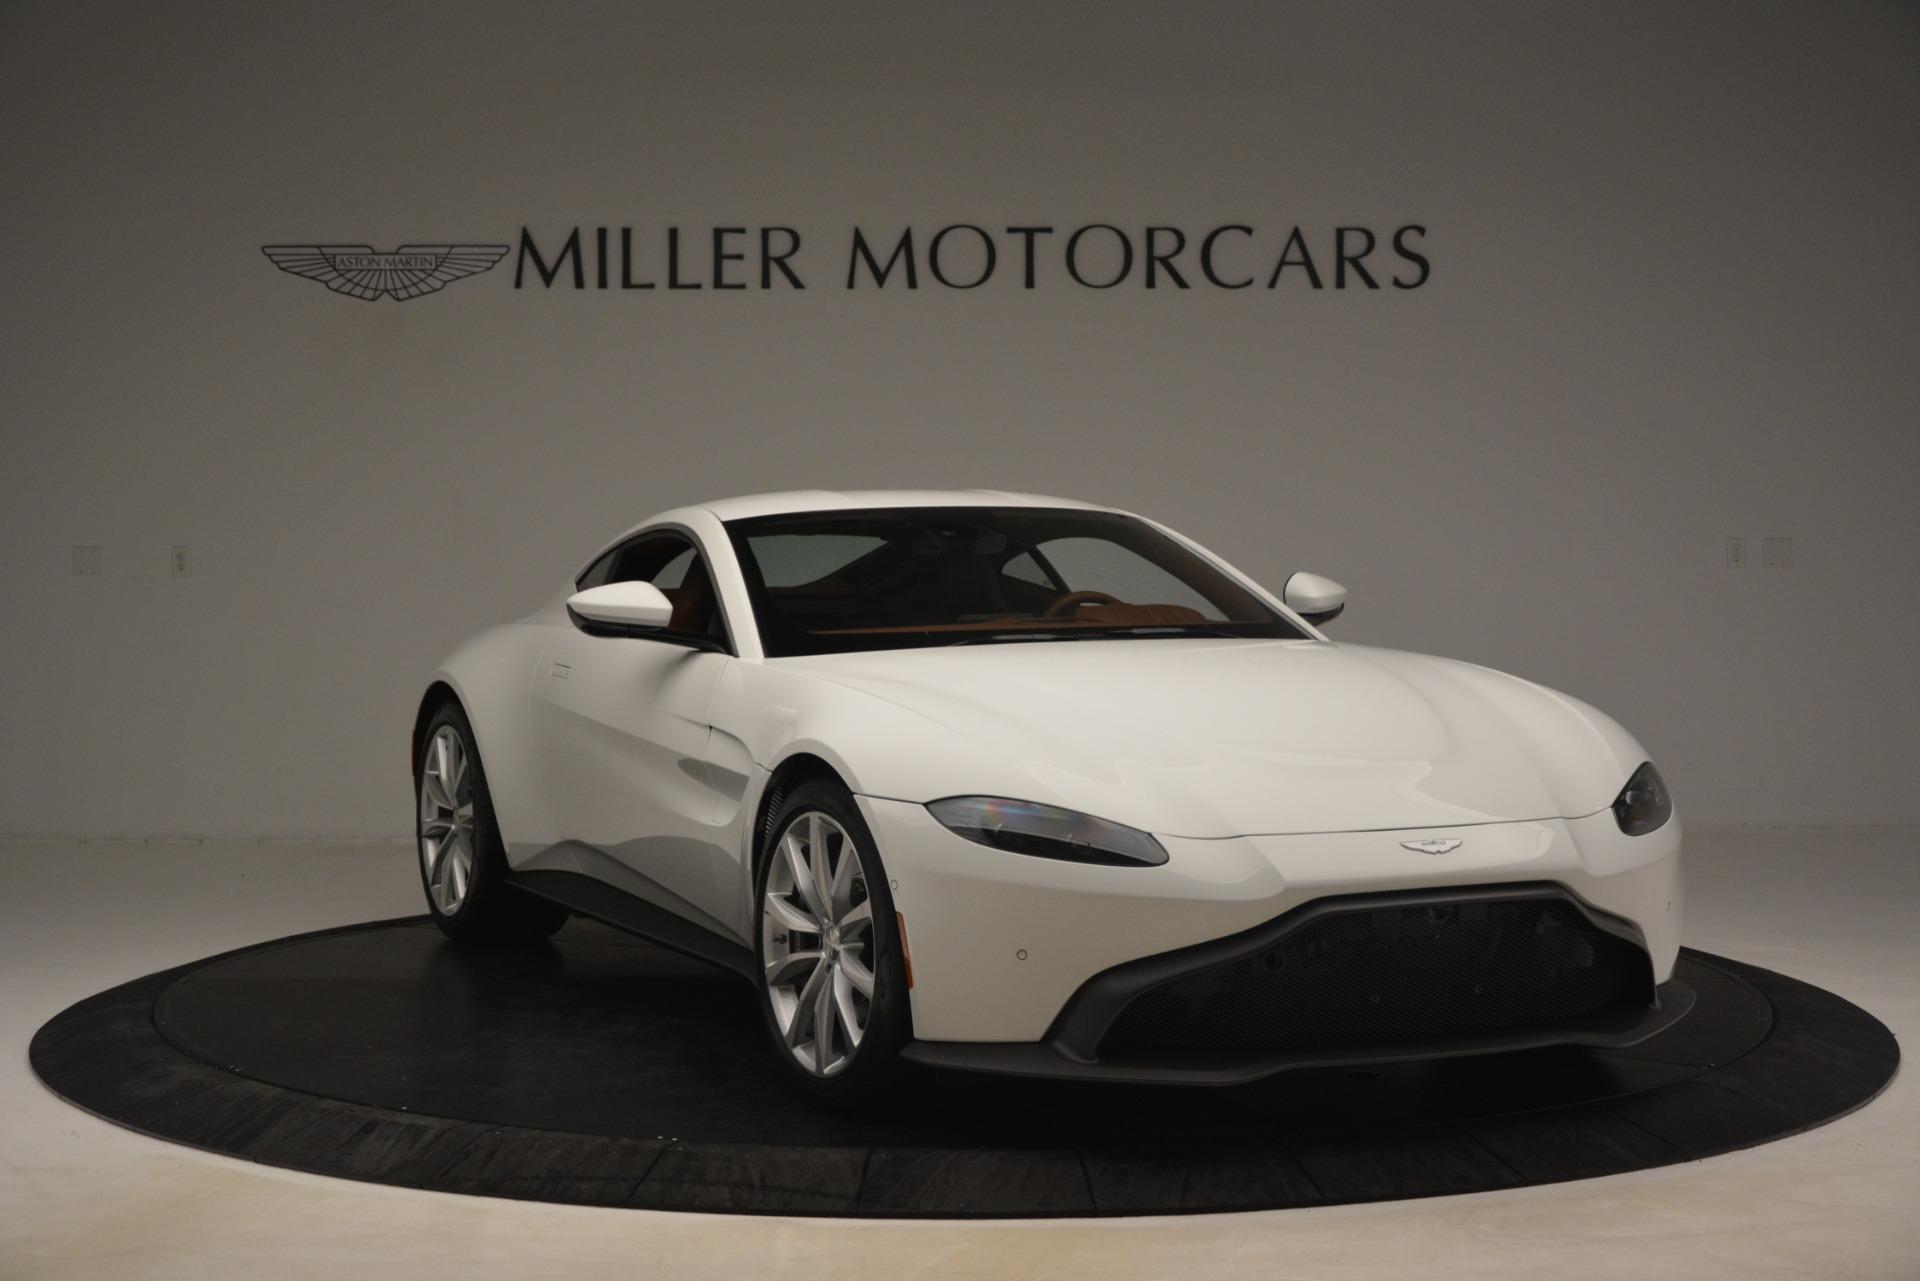 New 2019 Aston Martin Vantage Coupe For Sale In Greenwich, CT. Alfa Romeo of Greenwich, A1373 3227_p10